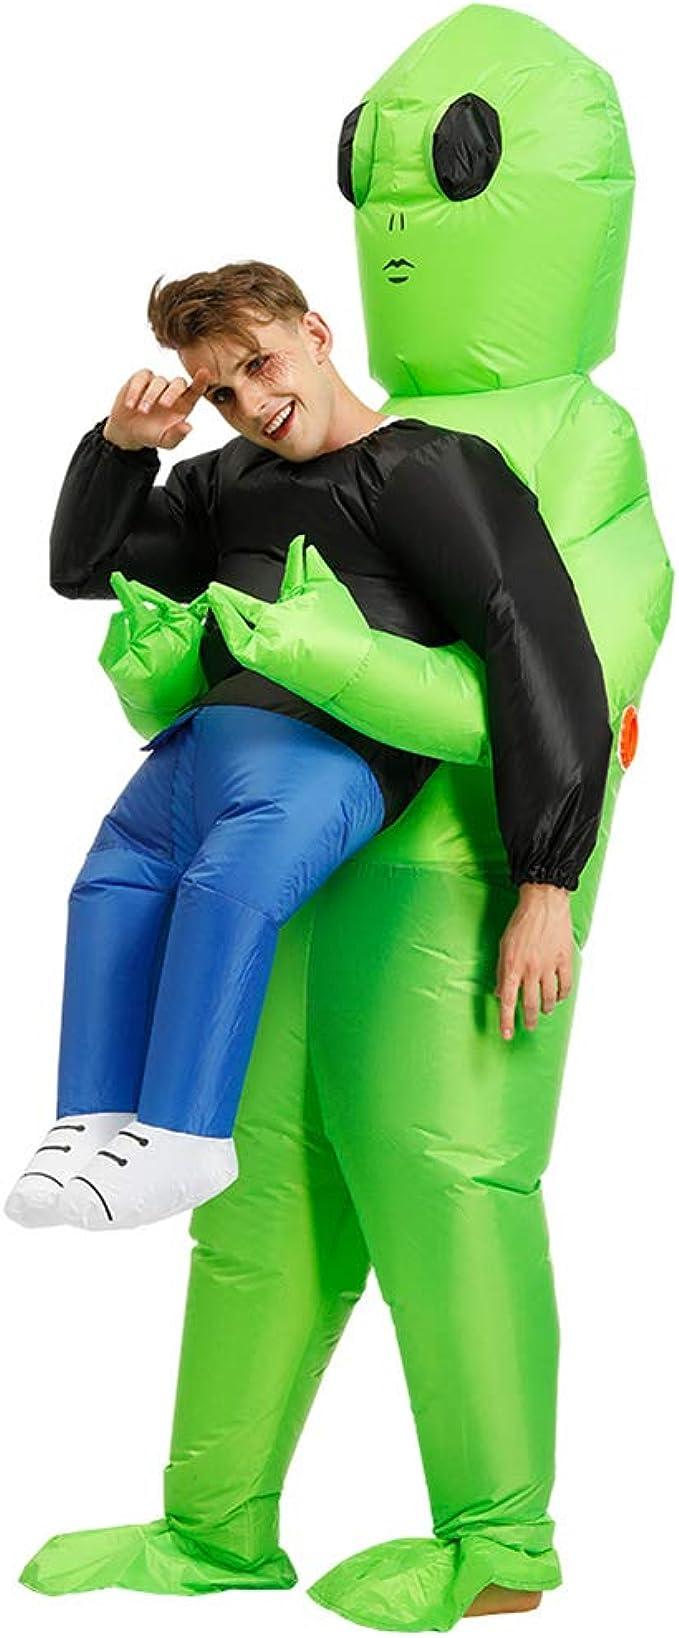 QUEENBACK Disfraz de Alien Verde Llevar a un ser Humano, Inflable ...